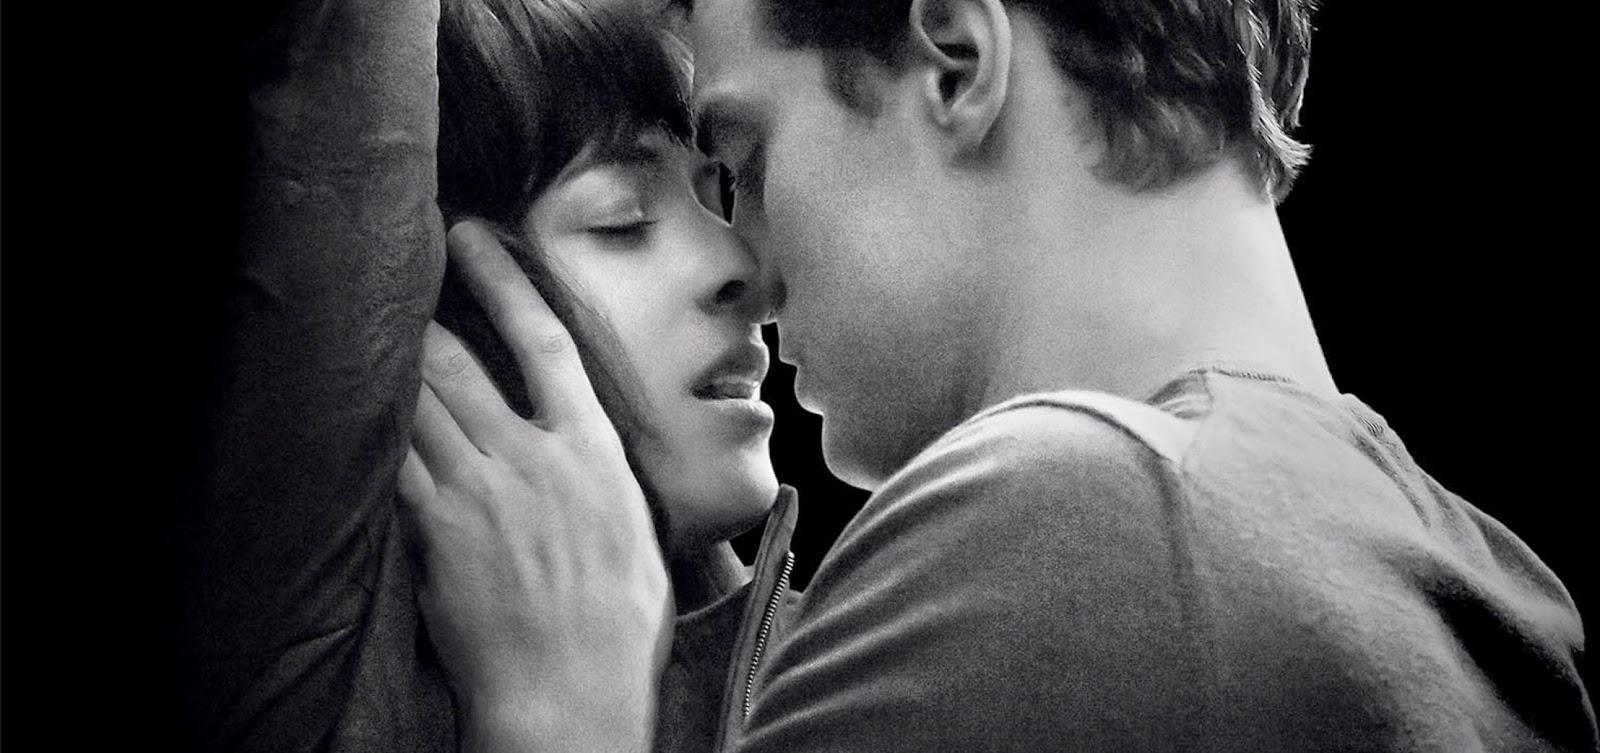 Christian Grey surpreende Anastasia Steele em cena de Cinquenta Tons de Cinza